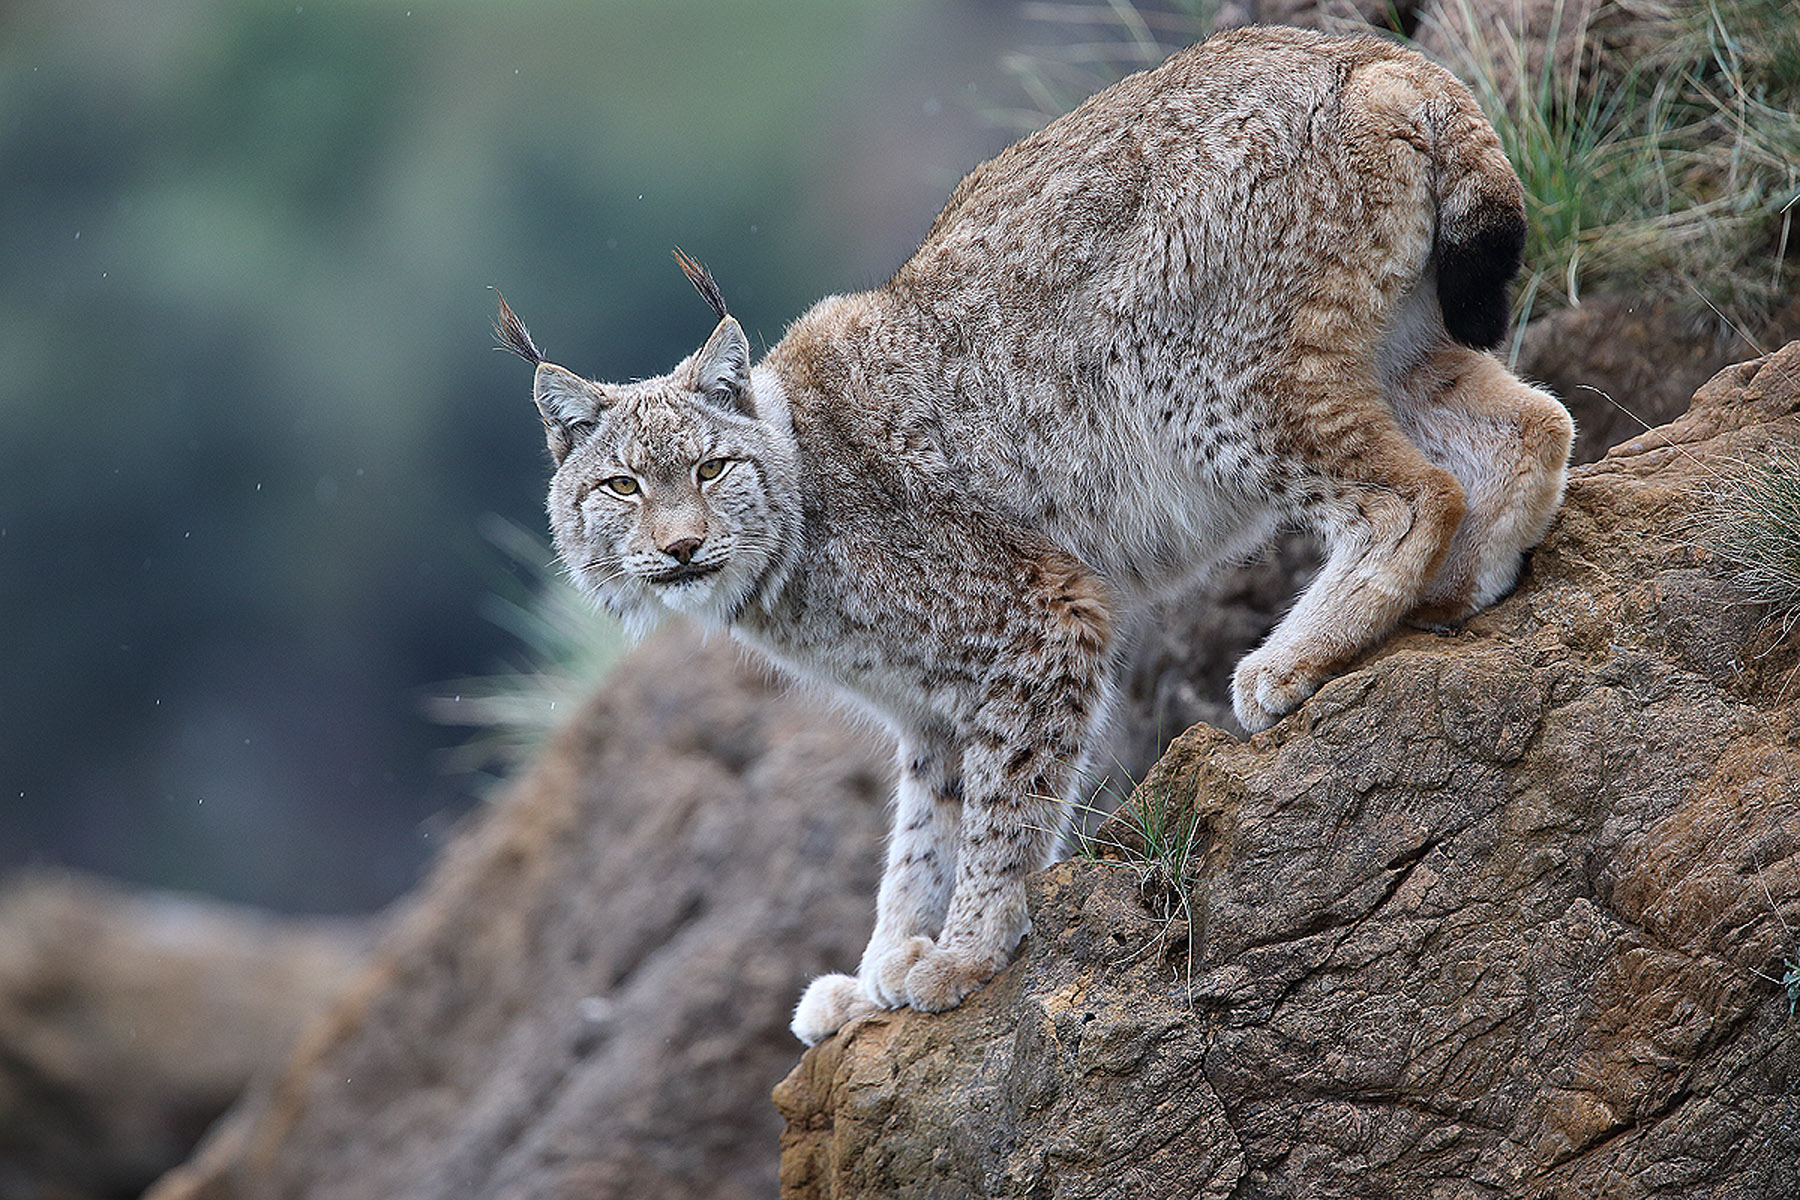 Lince Boreal (Lynx lynx) - Mamíferos - Iñigo Bernedo, Fotografía